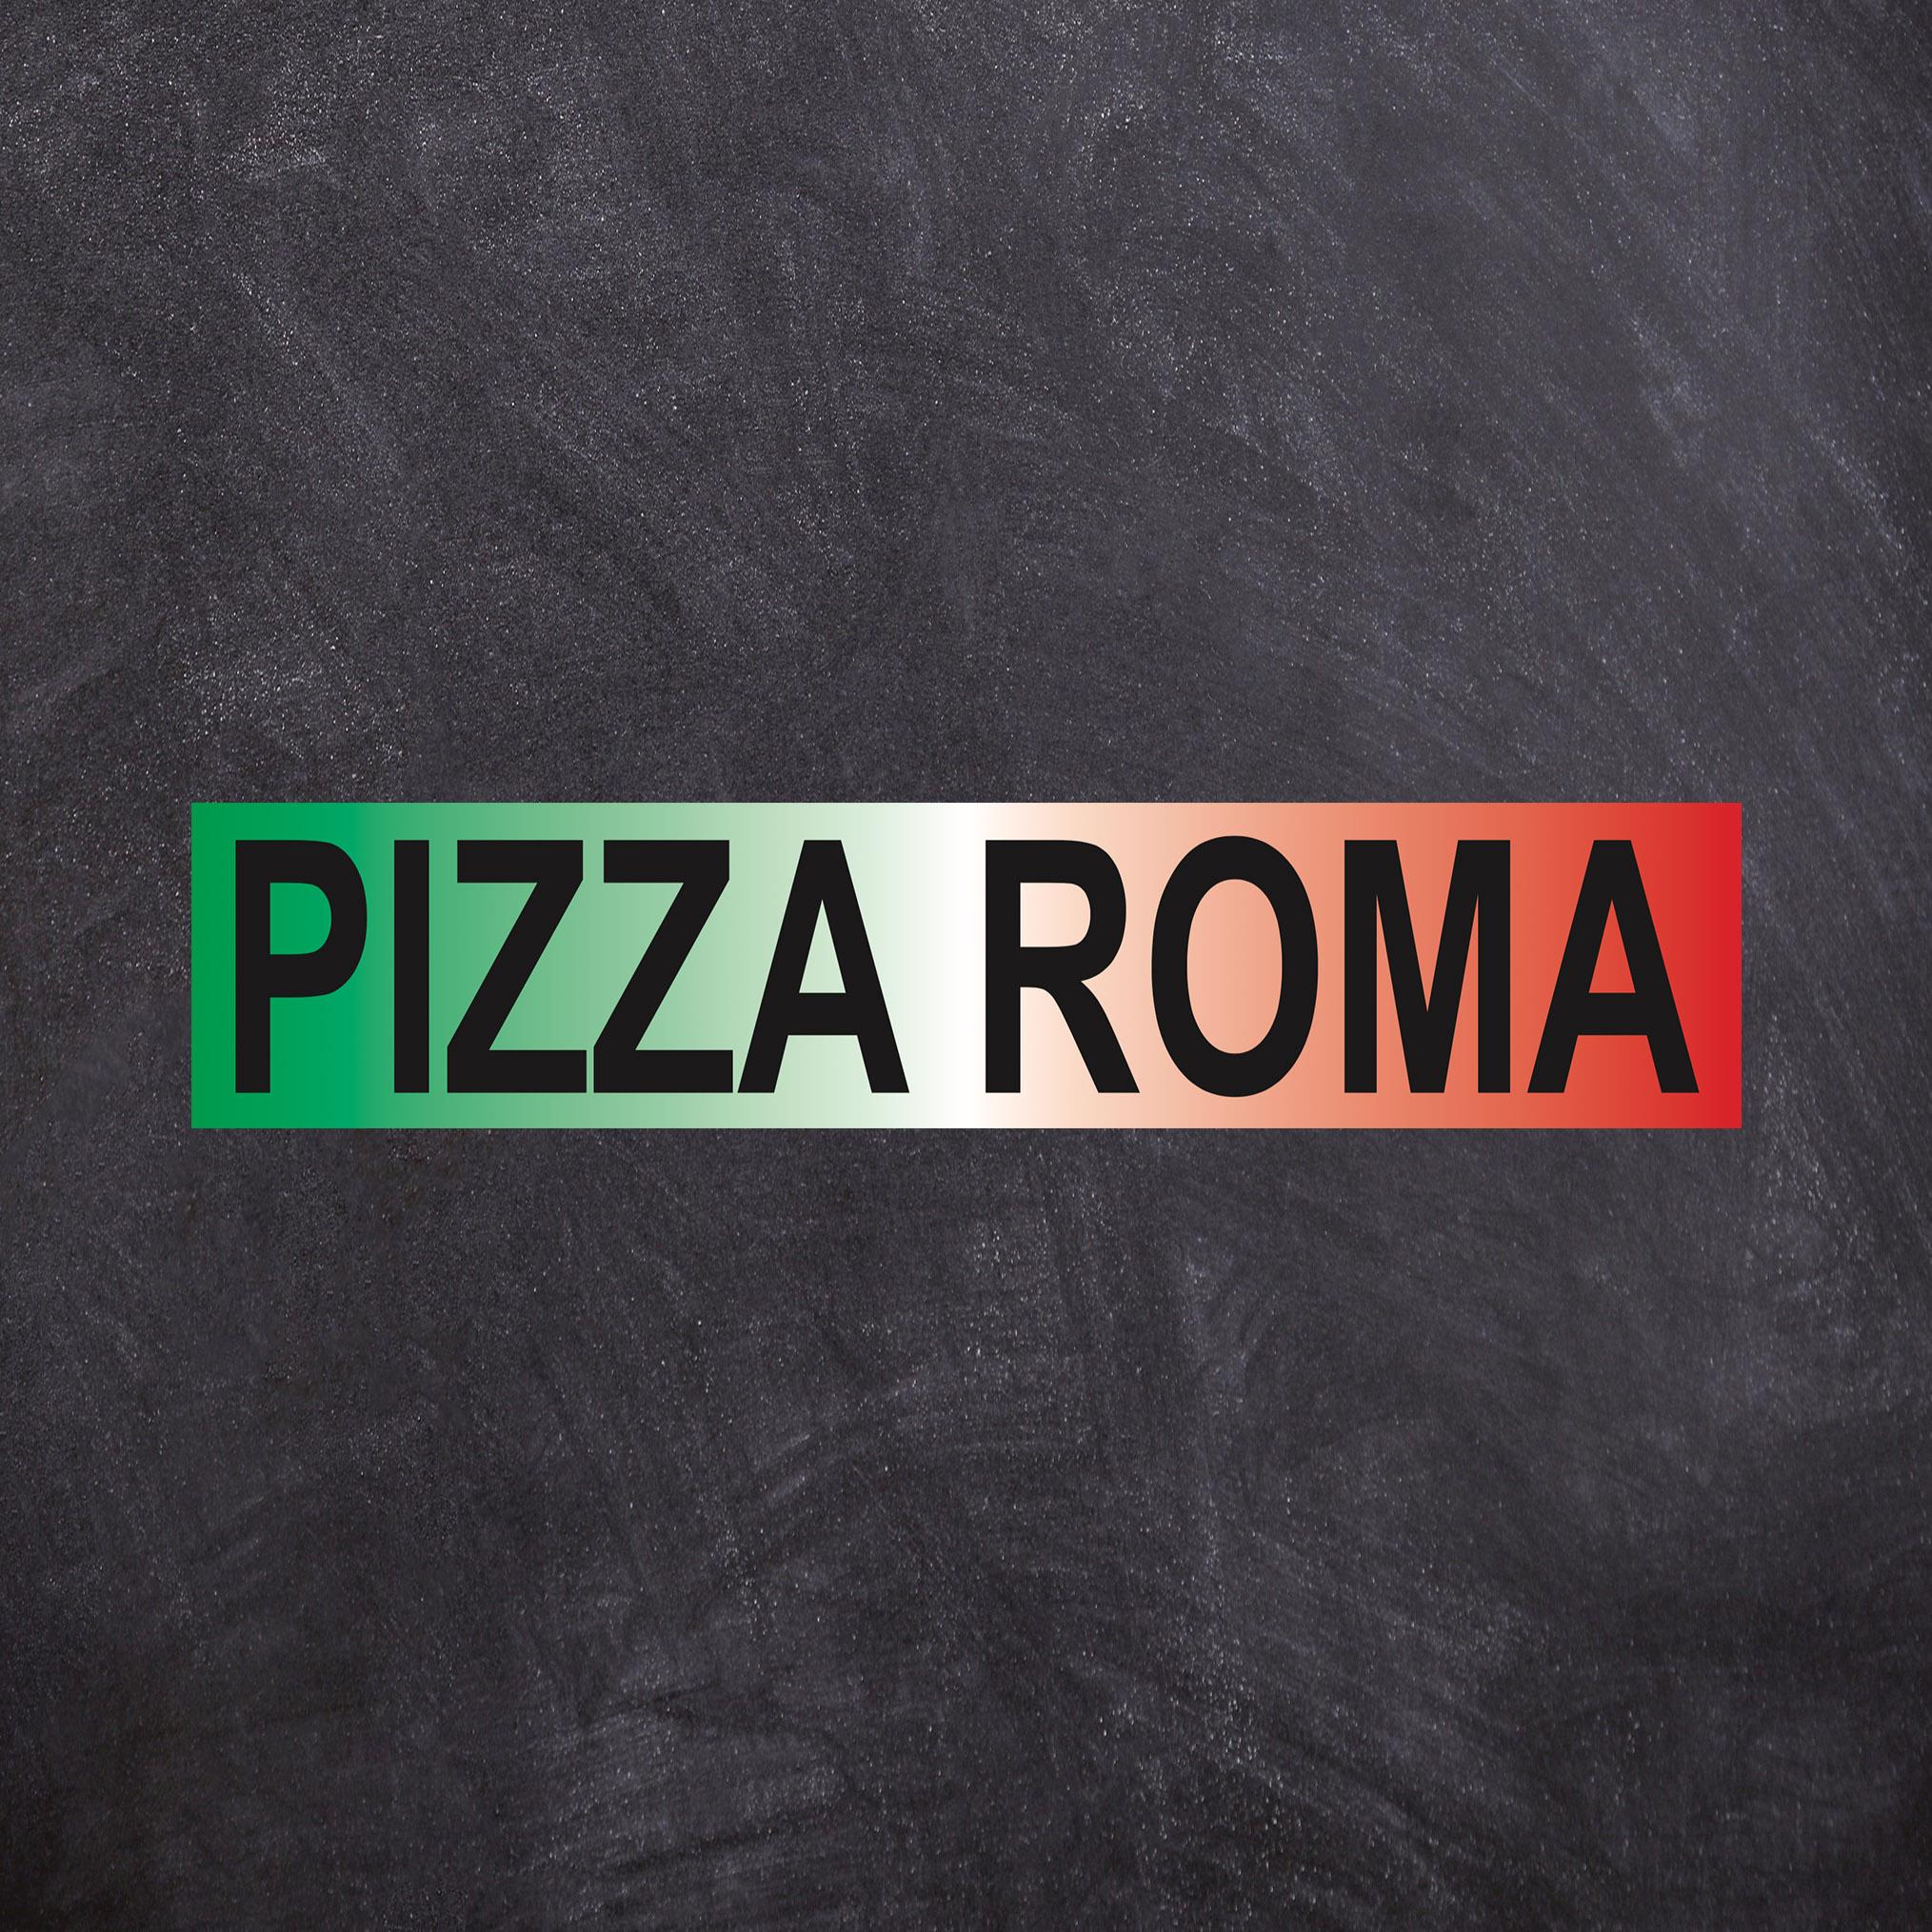 background-roma-logo-passau